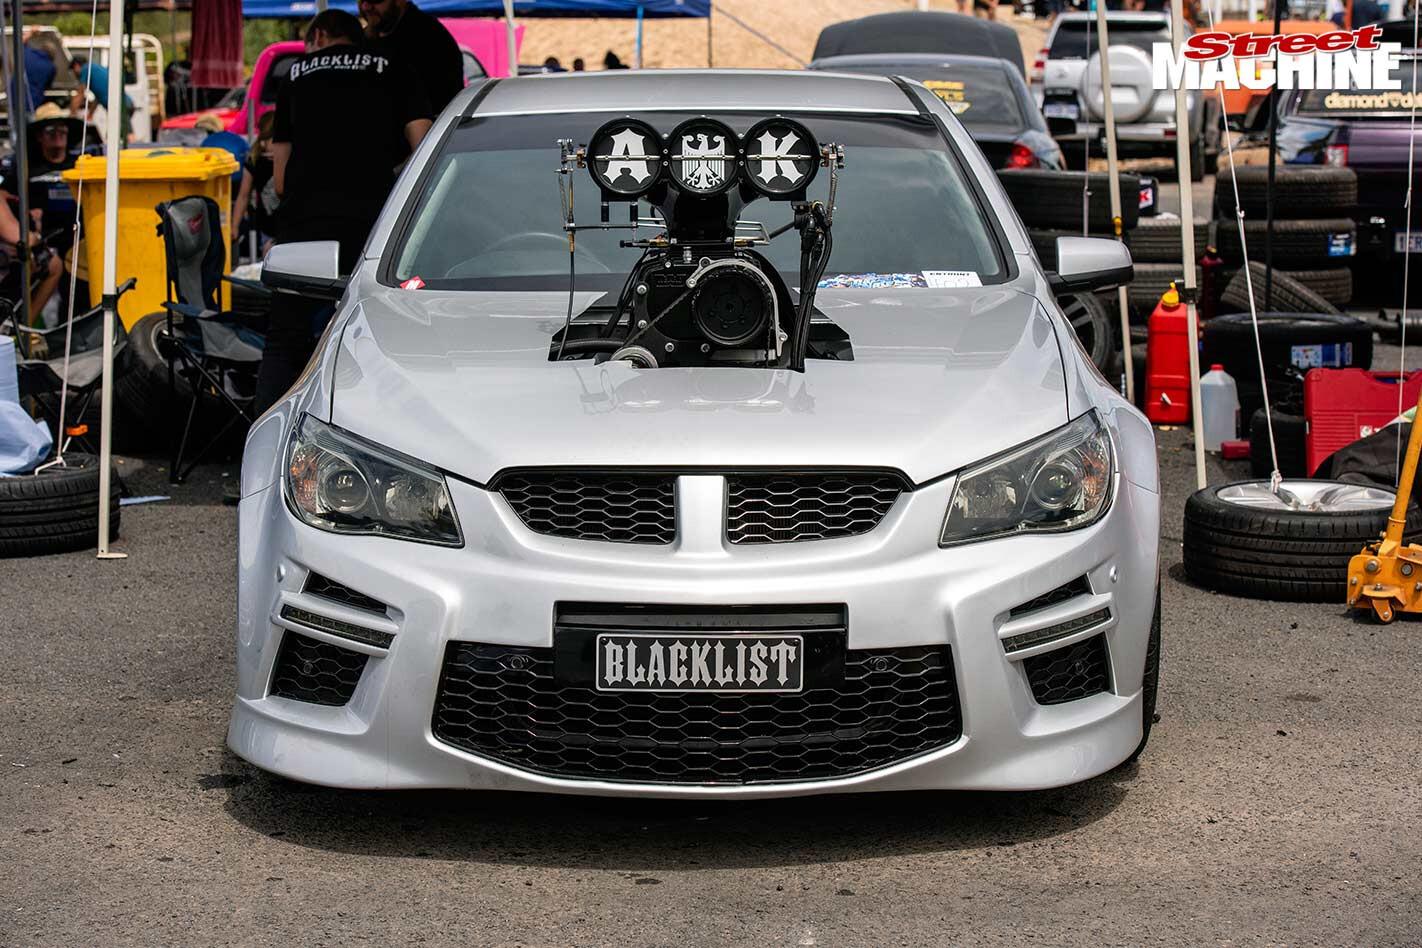 Holden Commodore BLACKLIST